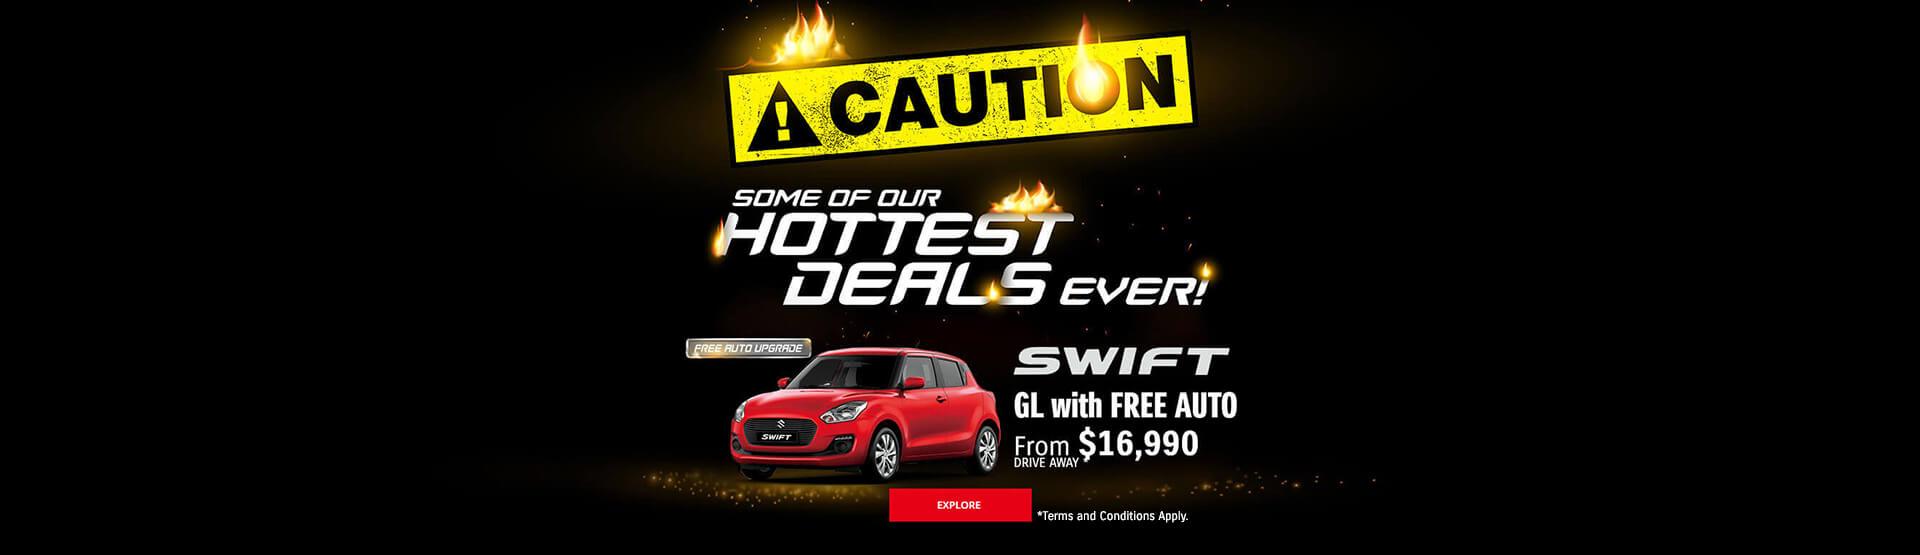 Swift GL with free auto